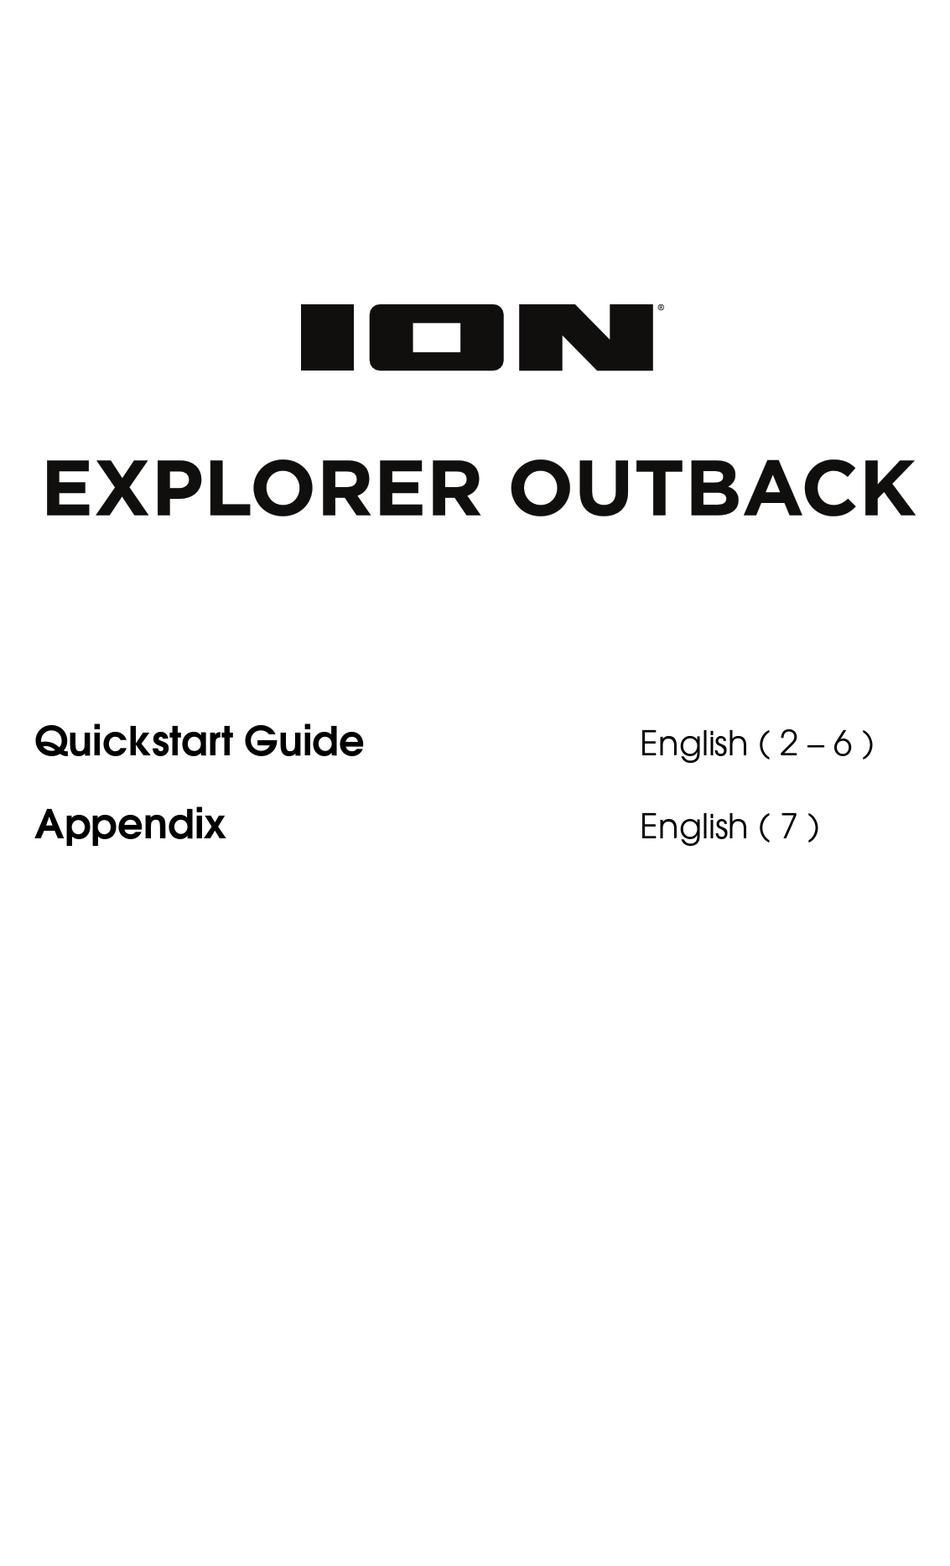 ION EXPLORER OUTBACK QUICK START MANUAL Pdf Download